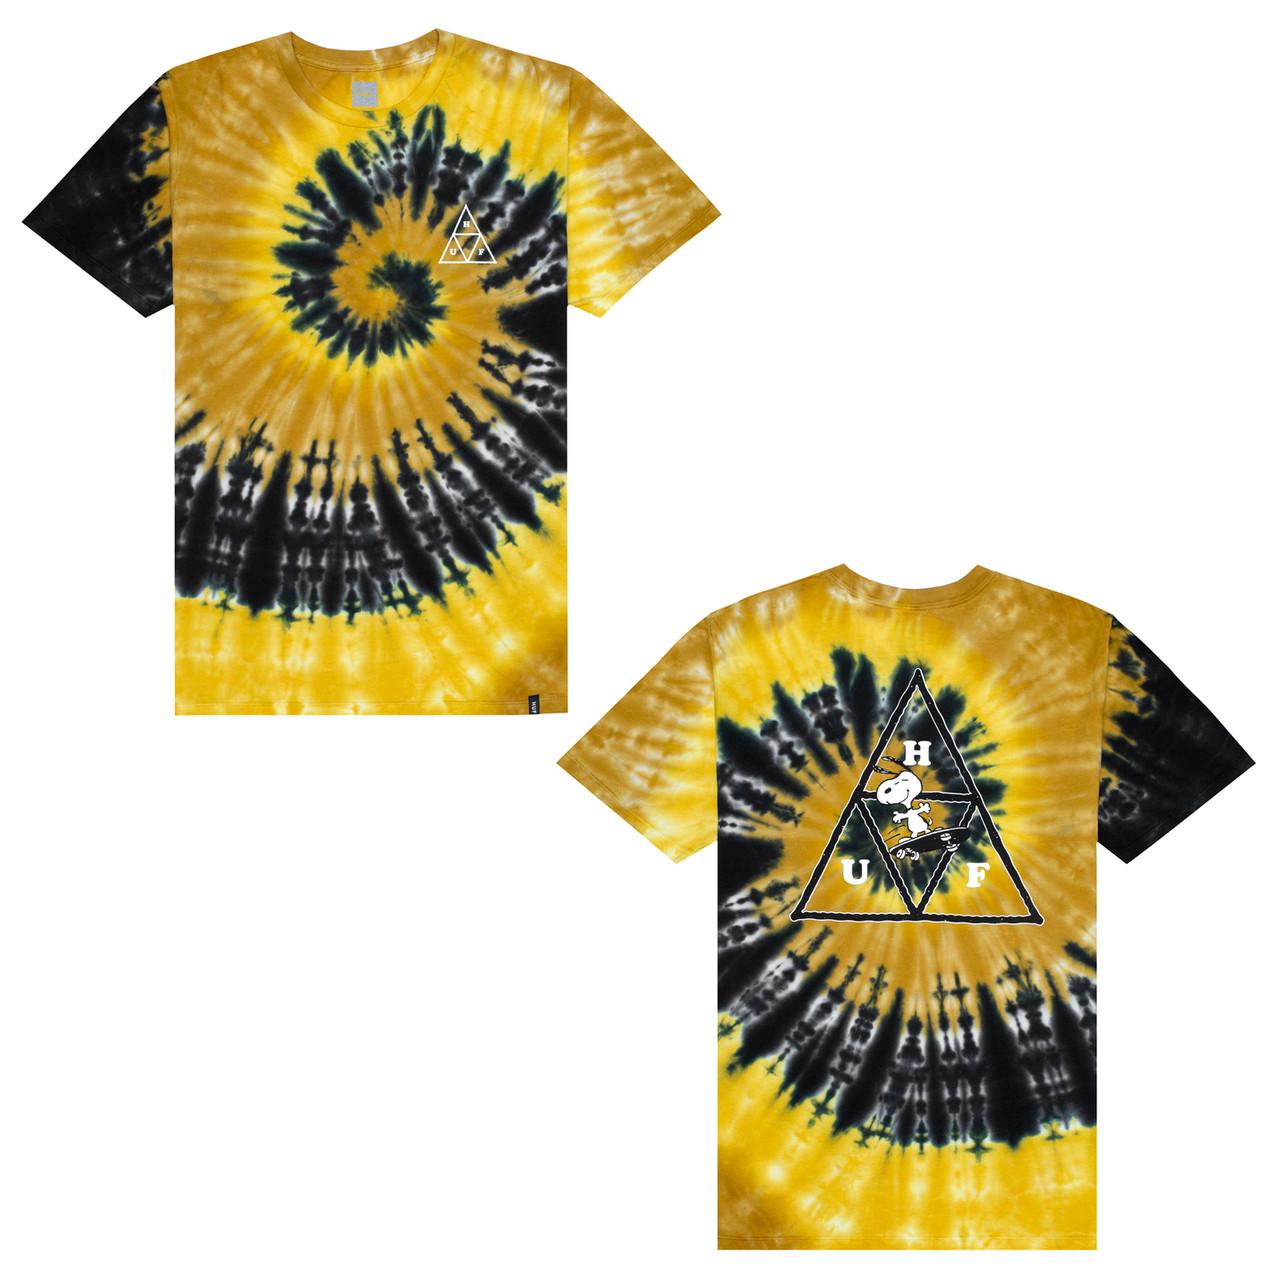 2ca2bf3c1d6fa3 ... Huf x Peanuts Shirt Snoopy Skates Yellow. Image 1. Click to enlarge